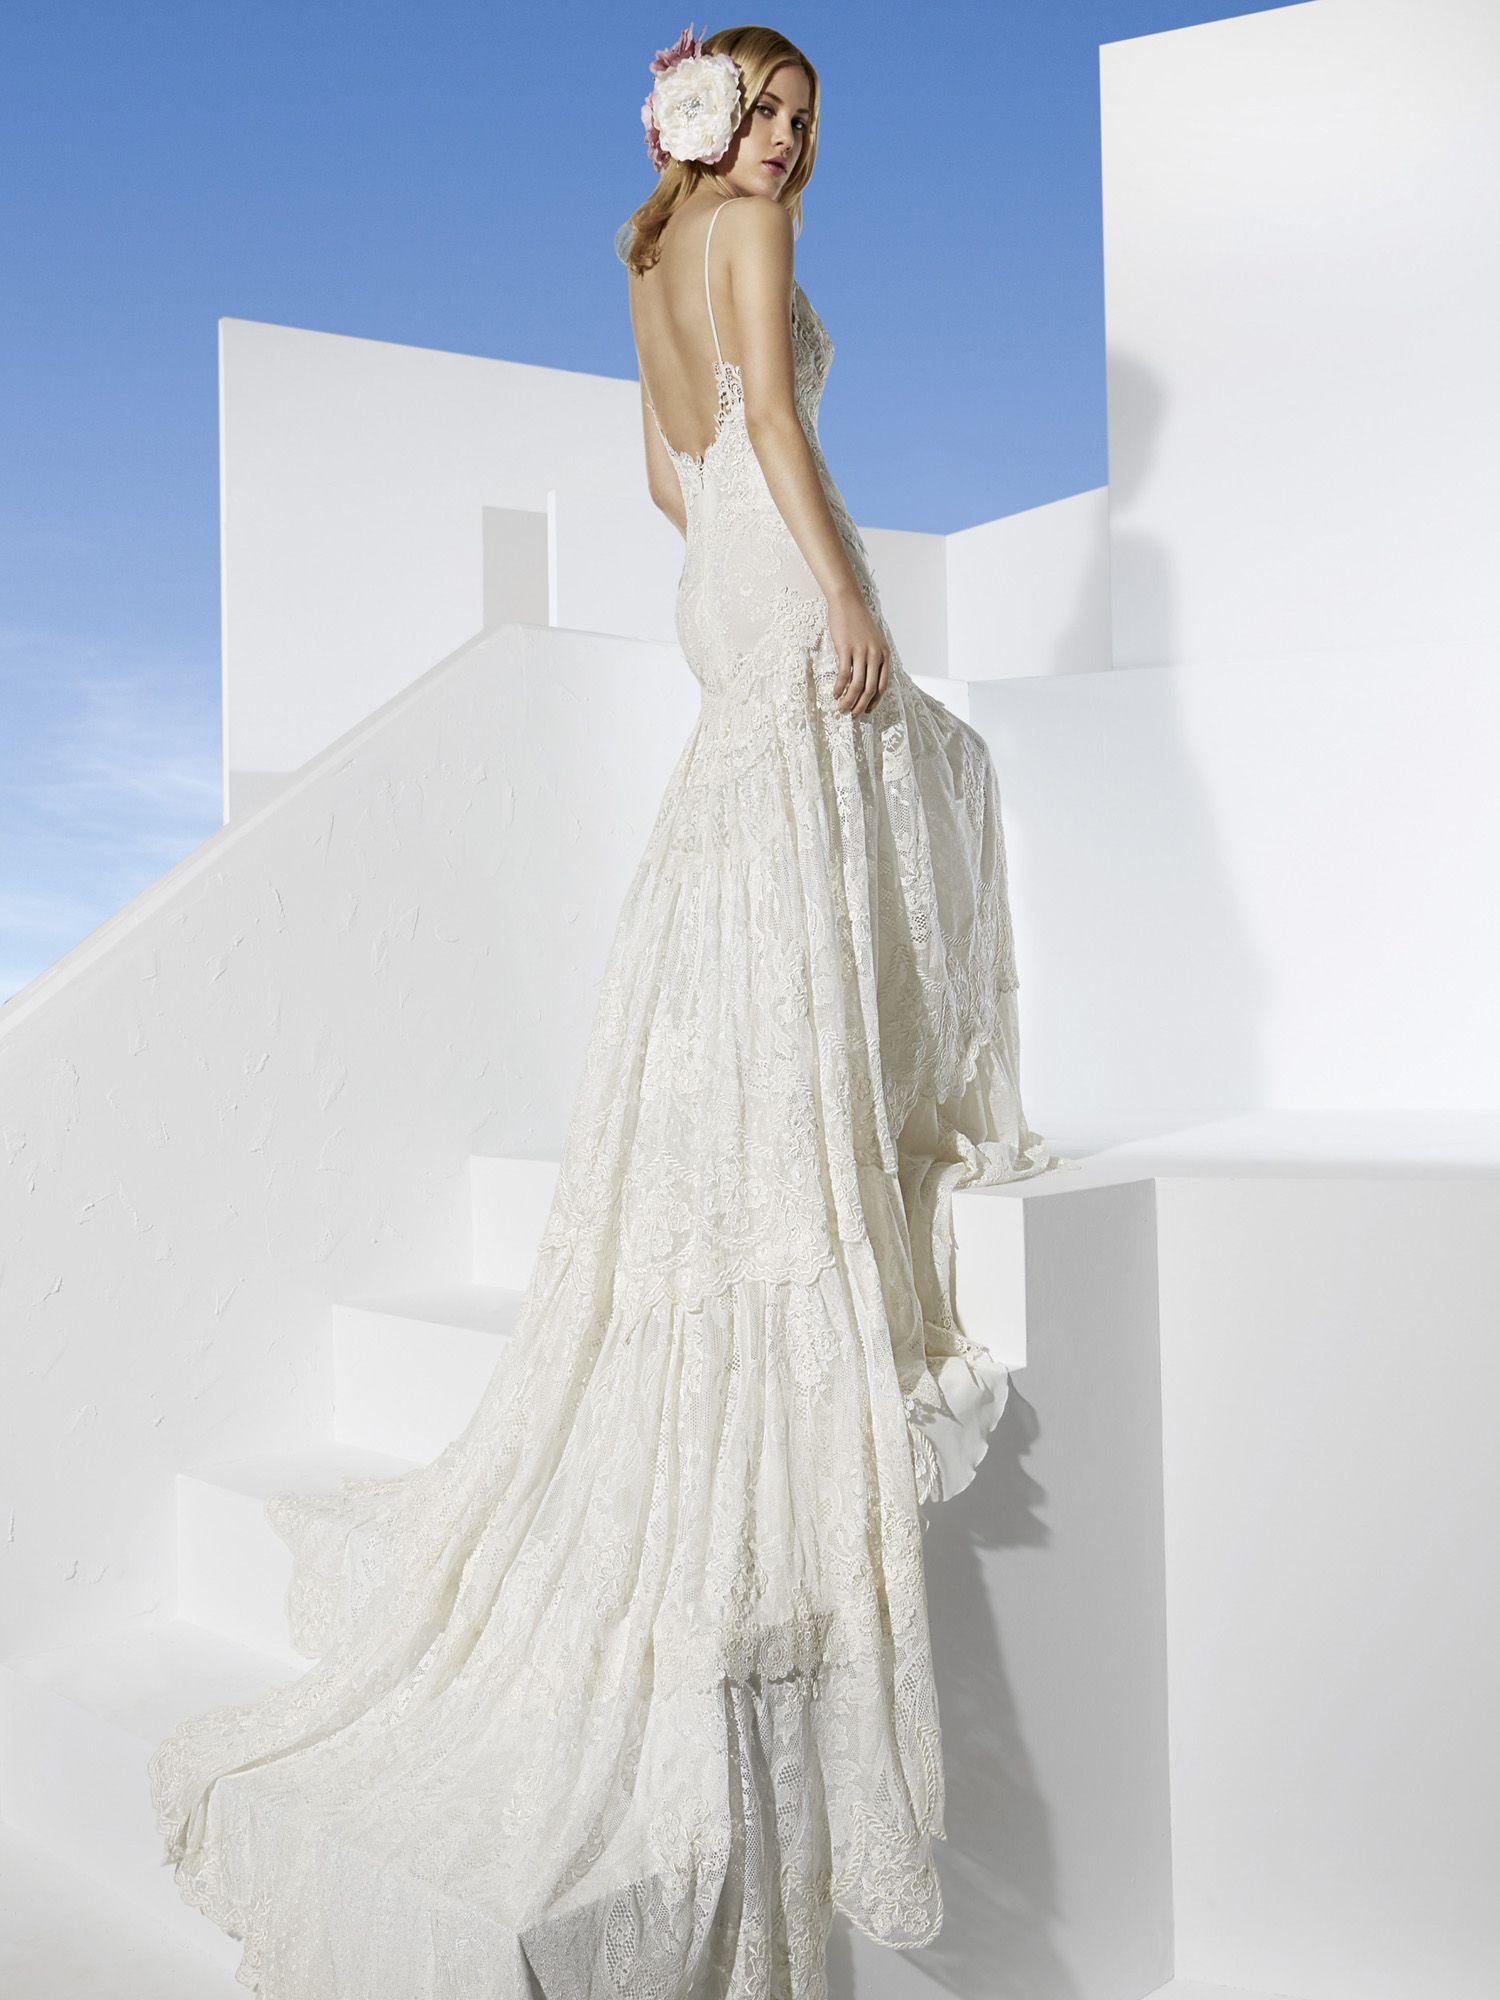 Vestidos de novia ibicencos en palma de mallorca